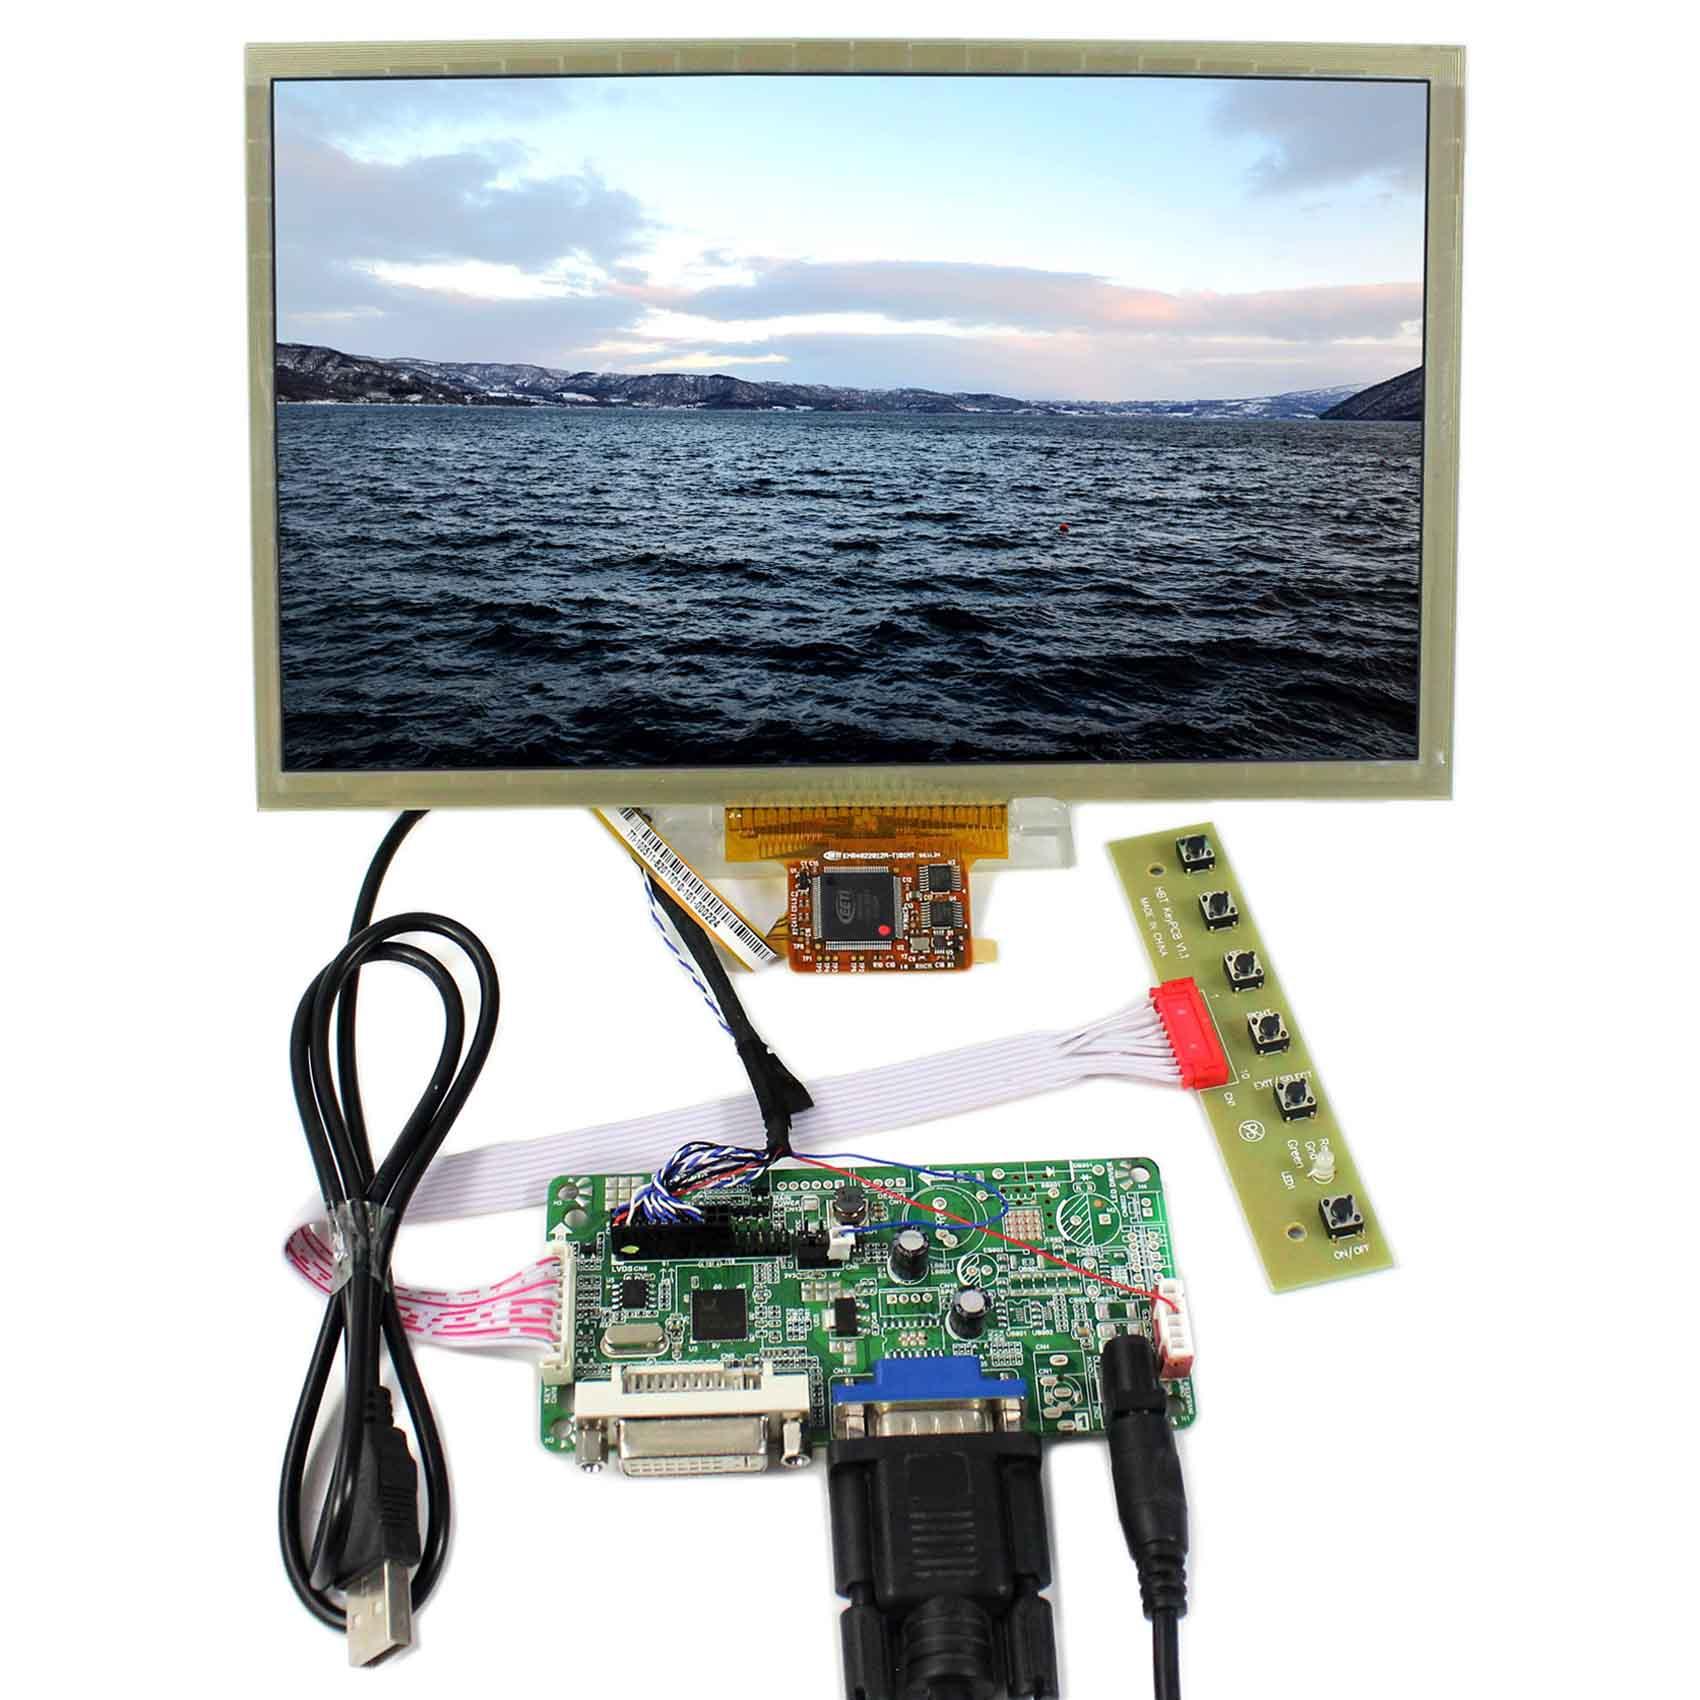 DVI+VGA LCD Controller Board 10.2 HSD100IFW1 CLAA102NA0ACW 1024x600 Multi-Touch LCD PanelDVI+VGA LCD Controller Board 10.2 HSD100IFW1 CLAA102NA0ACW 1024x600 Multi-Touch LCD Panel